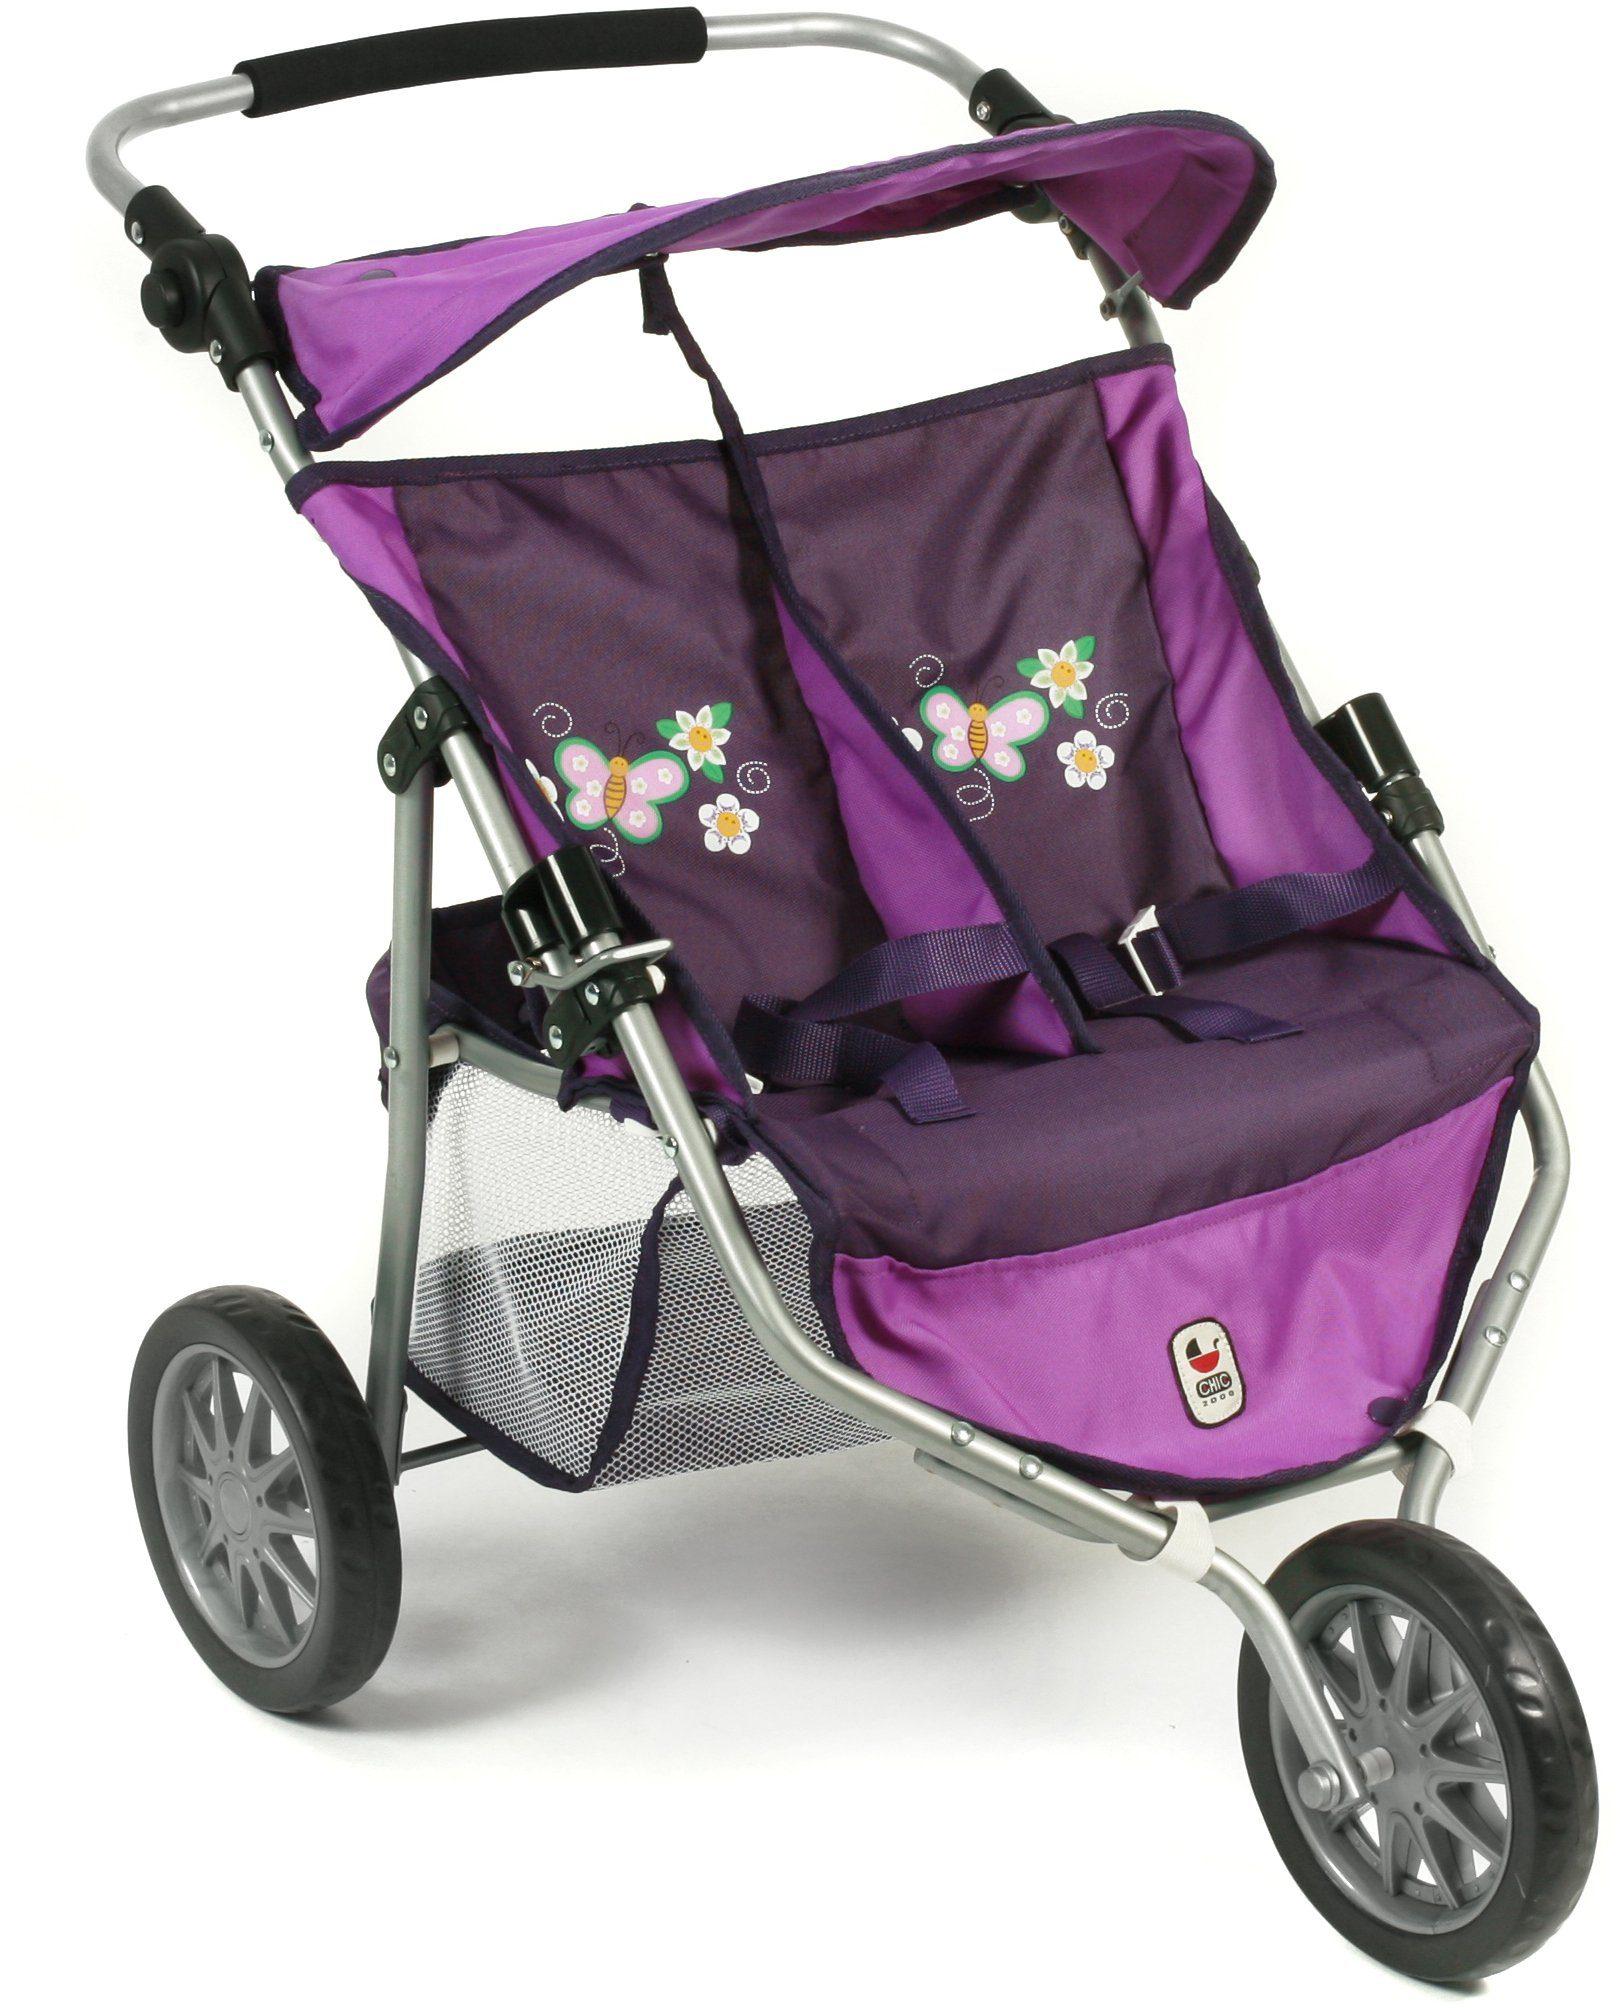 CHIC2000 Puppen Buggy mit umklappbarem Sonnenverdeck, »Zwillingsjogger purple«